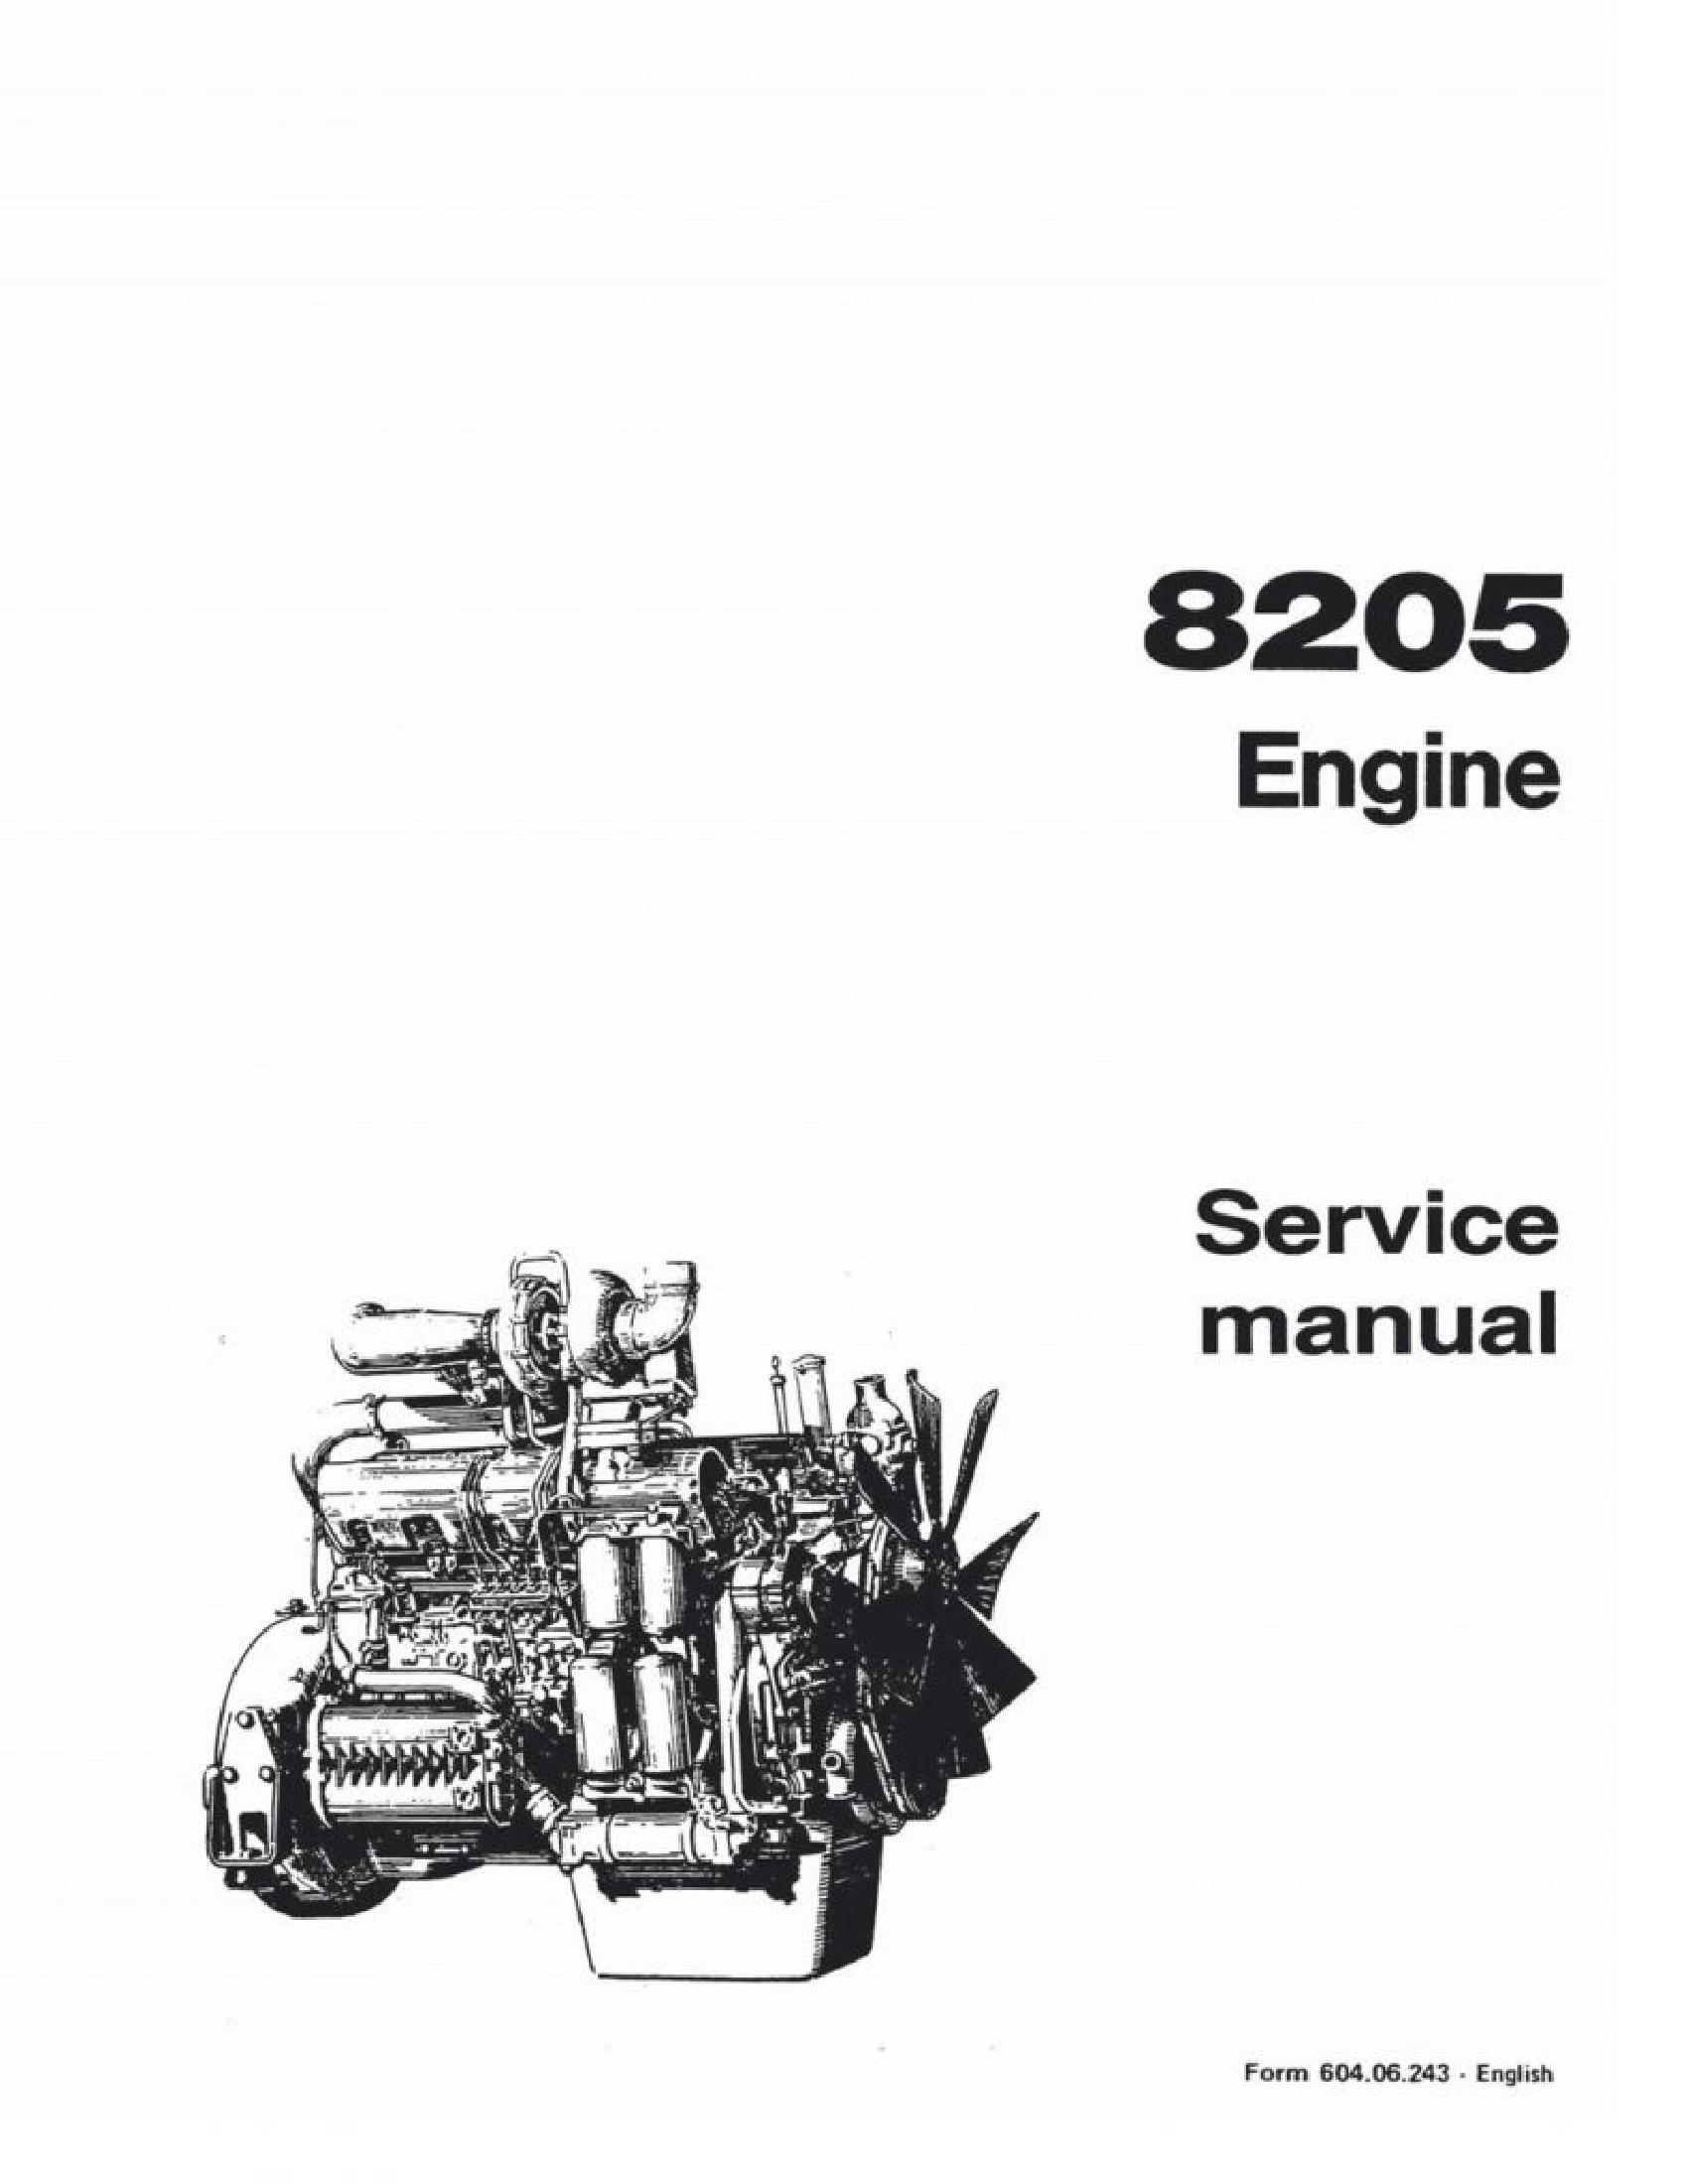 Fiat-Allis 8205 Engine manual